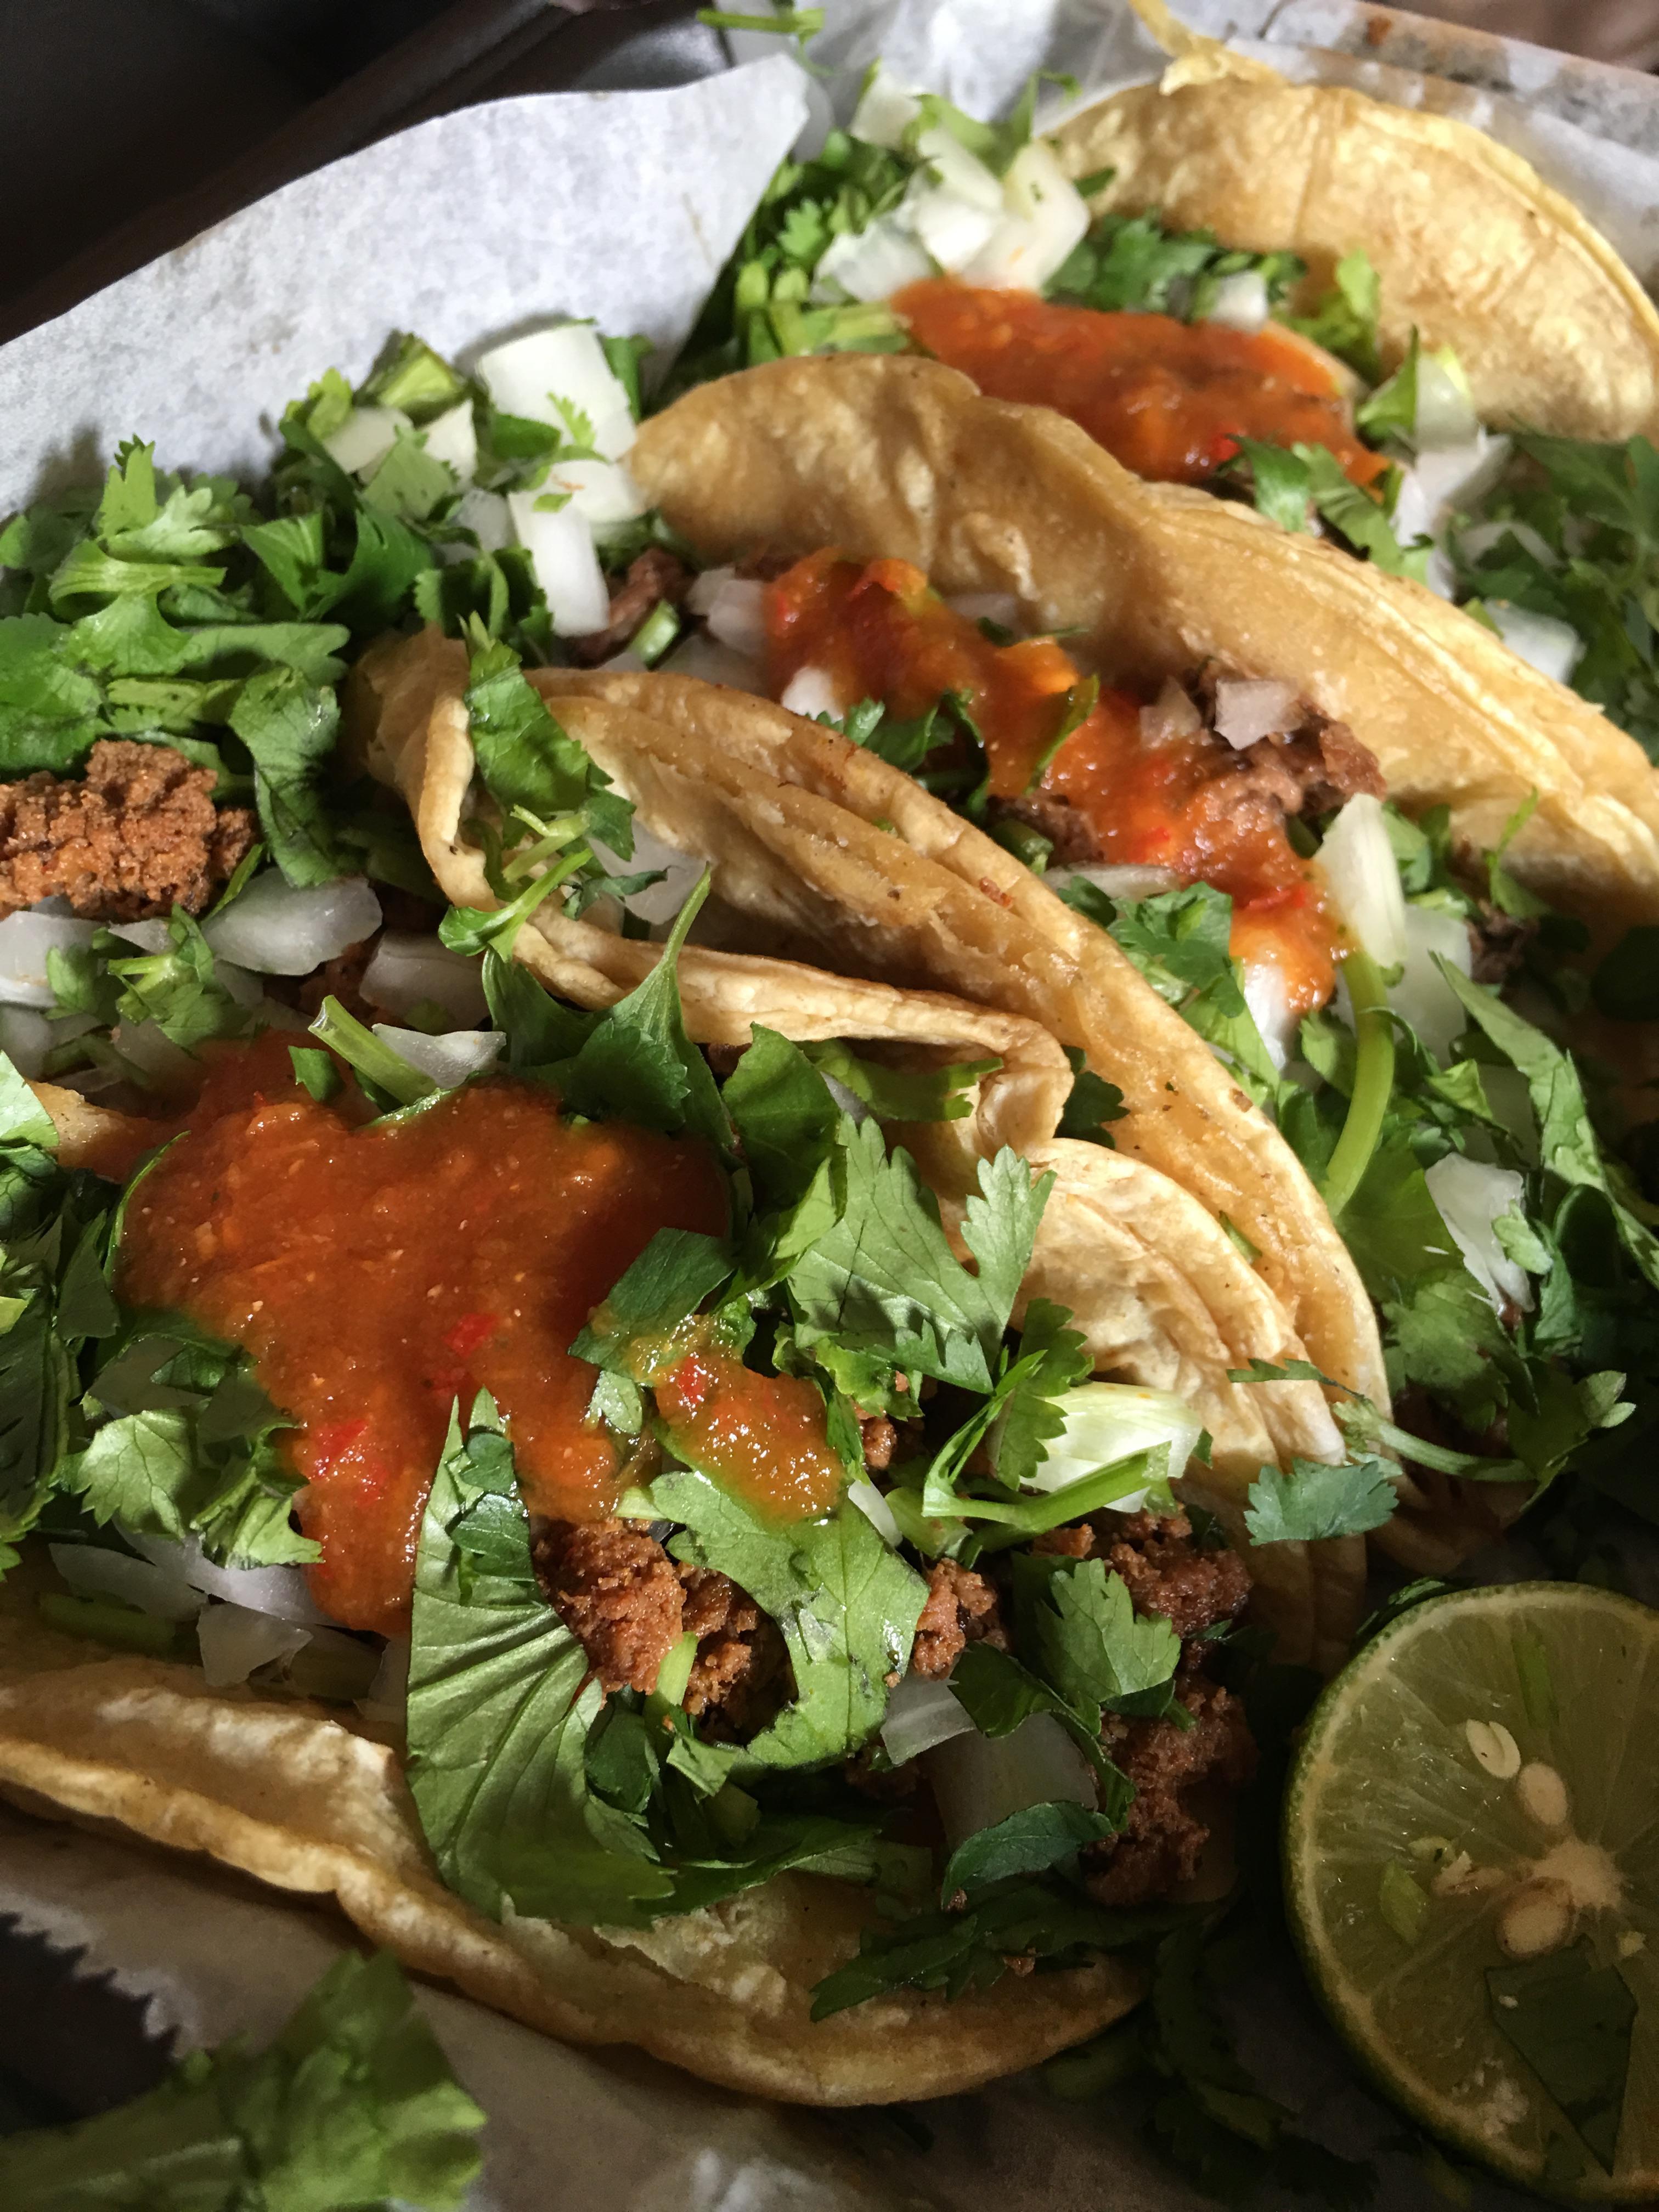 Salsa Grille Tacos at George's International Market